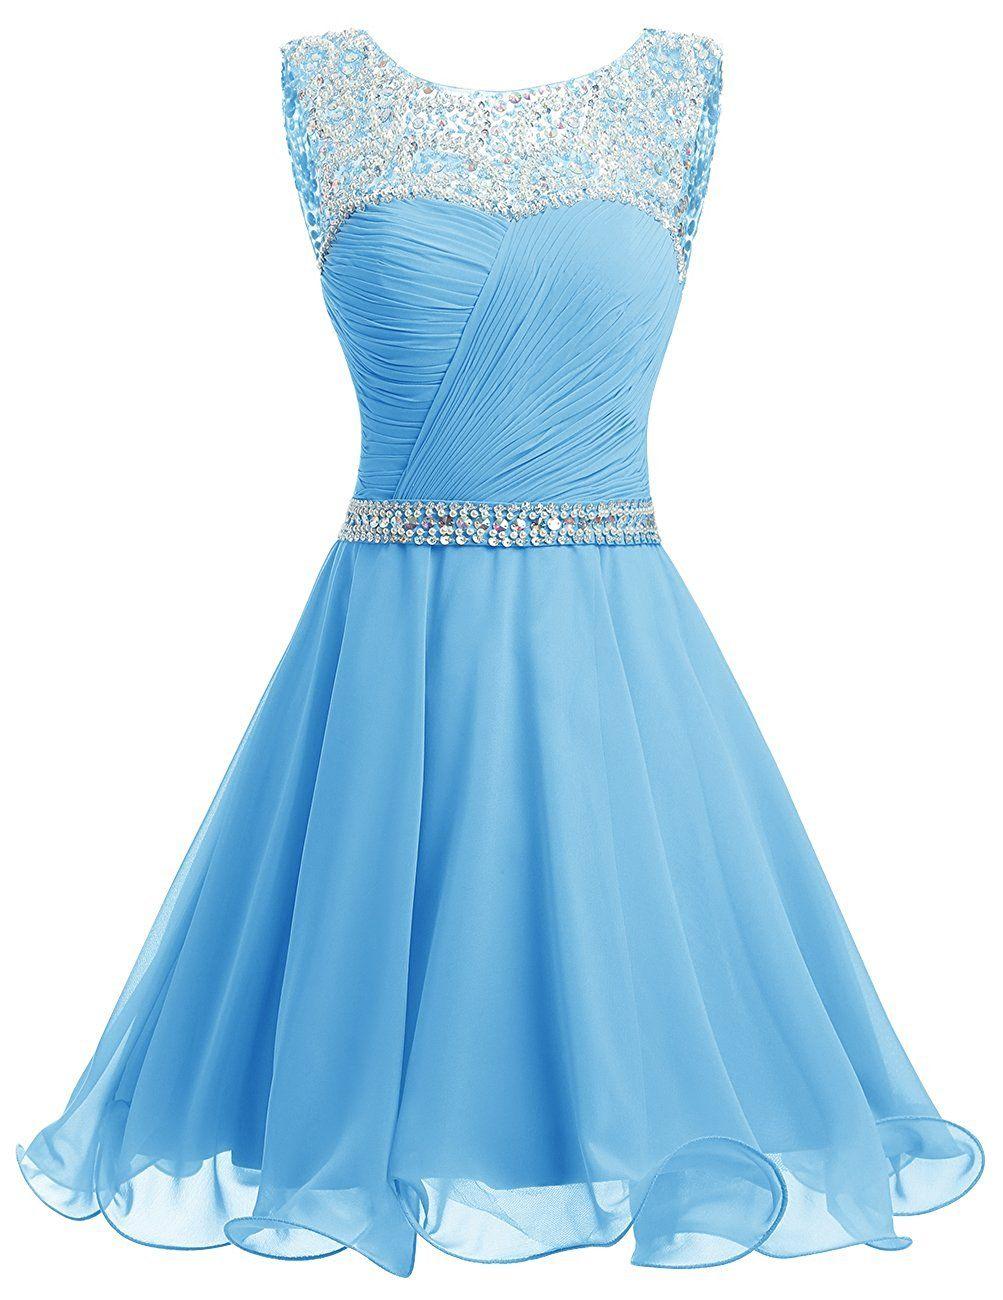 713bbc7a520 Dresstells® Short Chiffon Open Back Prom Dress With Beading Homecoming Dress:  Amazon.co.uk: Clothing